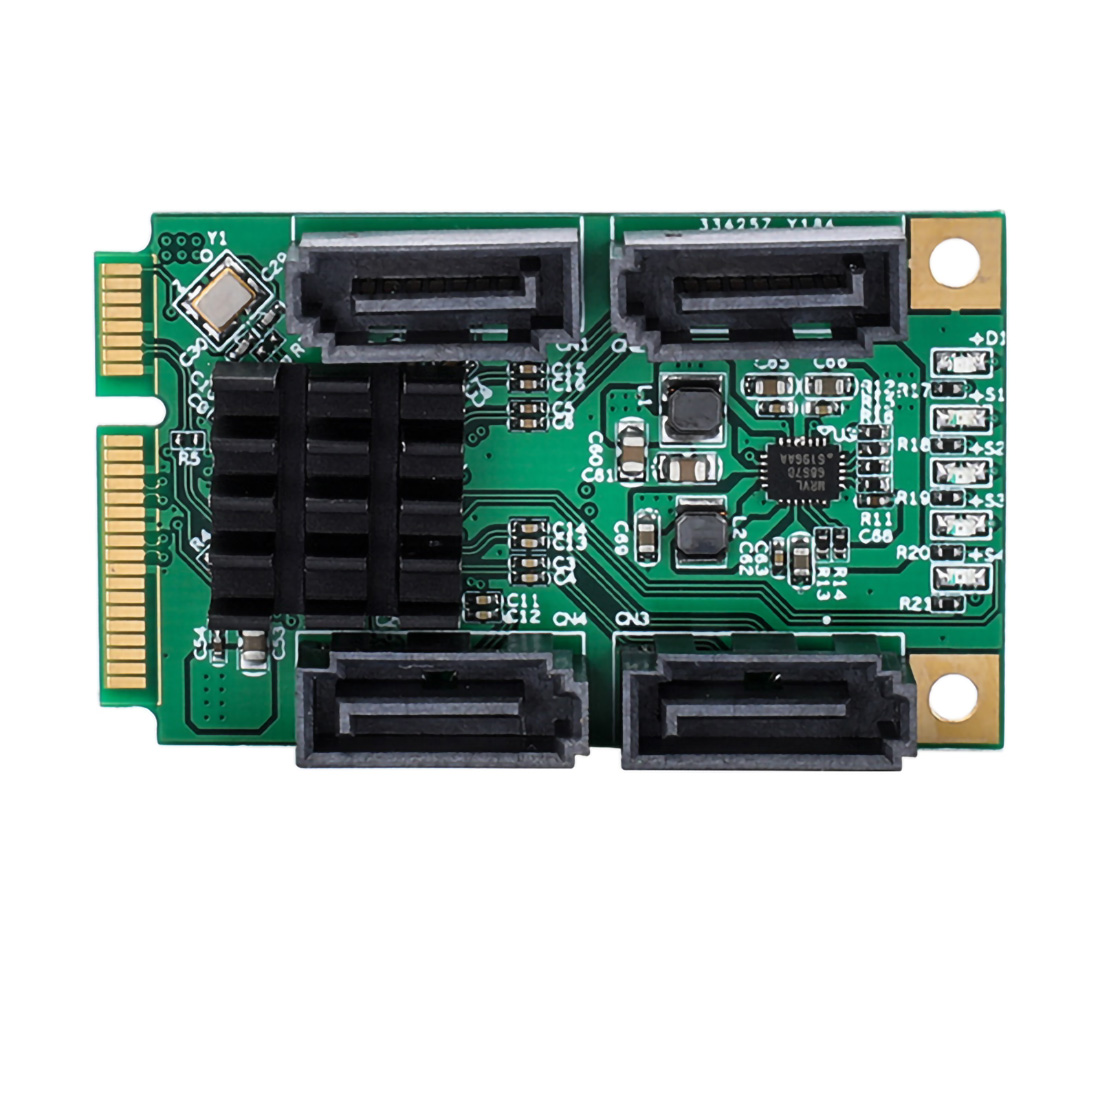 XT-XINTE Mini PCIE 4 Ports SATA III pci-express carte contrôleur SATA 3.0 Mini PCI-E disque dur SSD adaptateur carte d'extension - 2